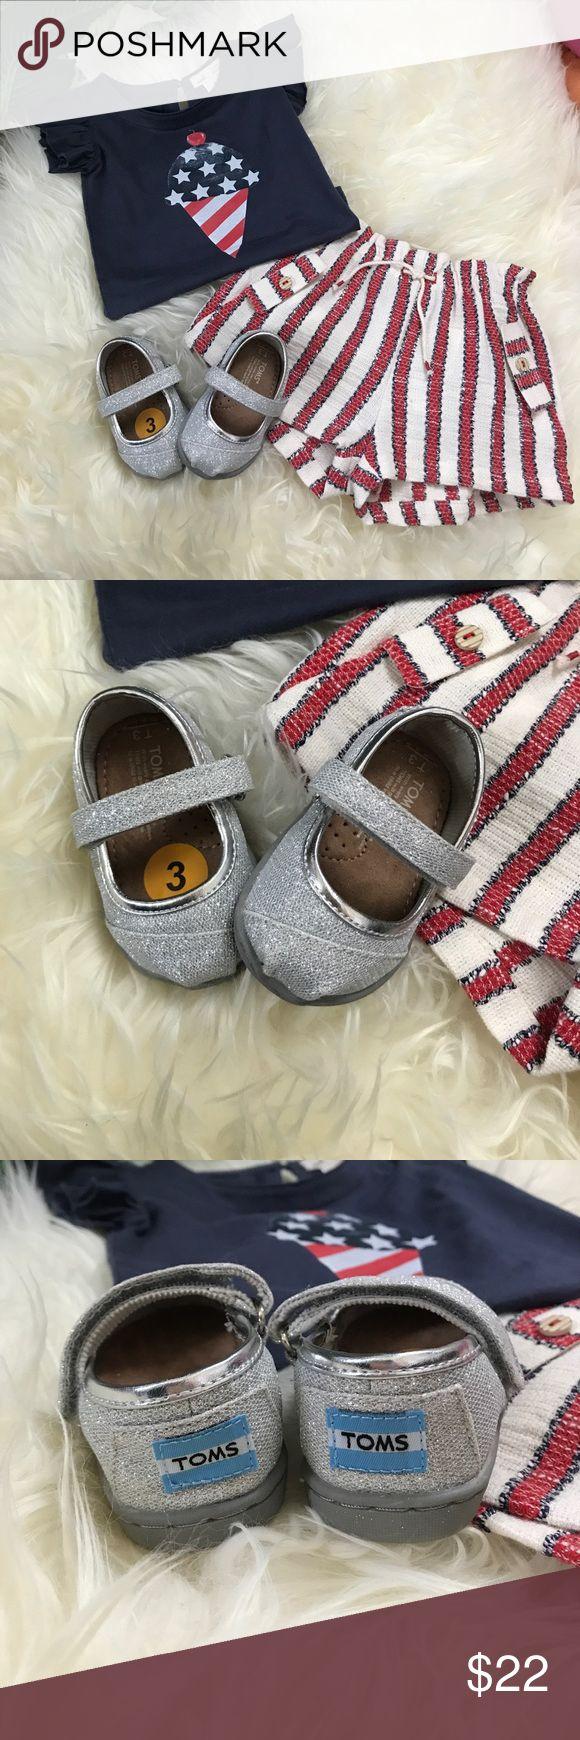 NWT Sz 3 silver sparkle Tiny Toms Tiny Toms Sz 3 Mary Jane style silver sparkle shoes. Toms Shoes Baby & Walker